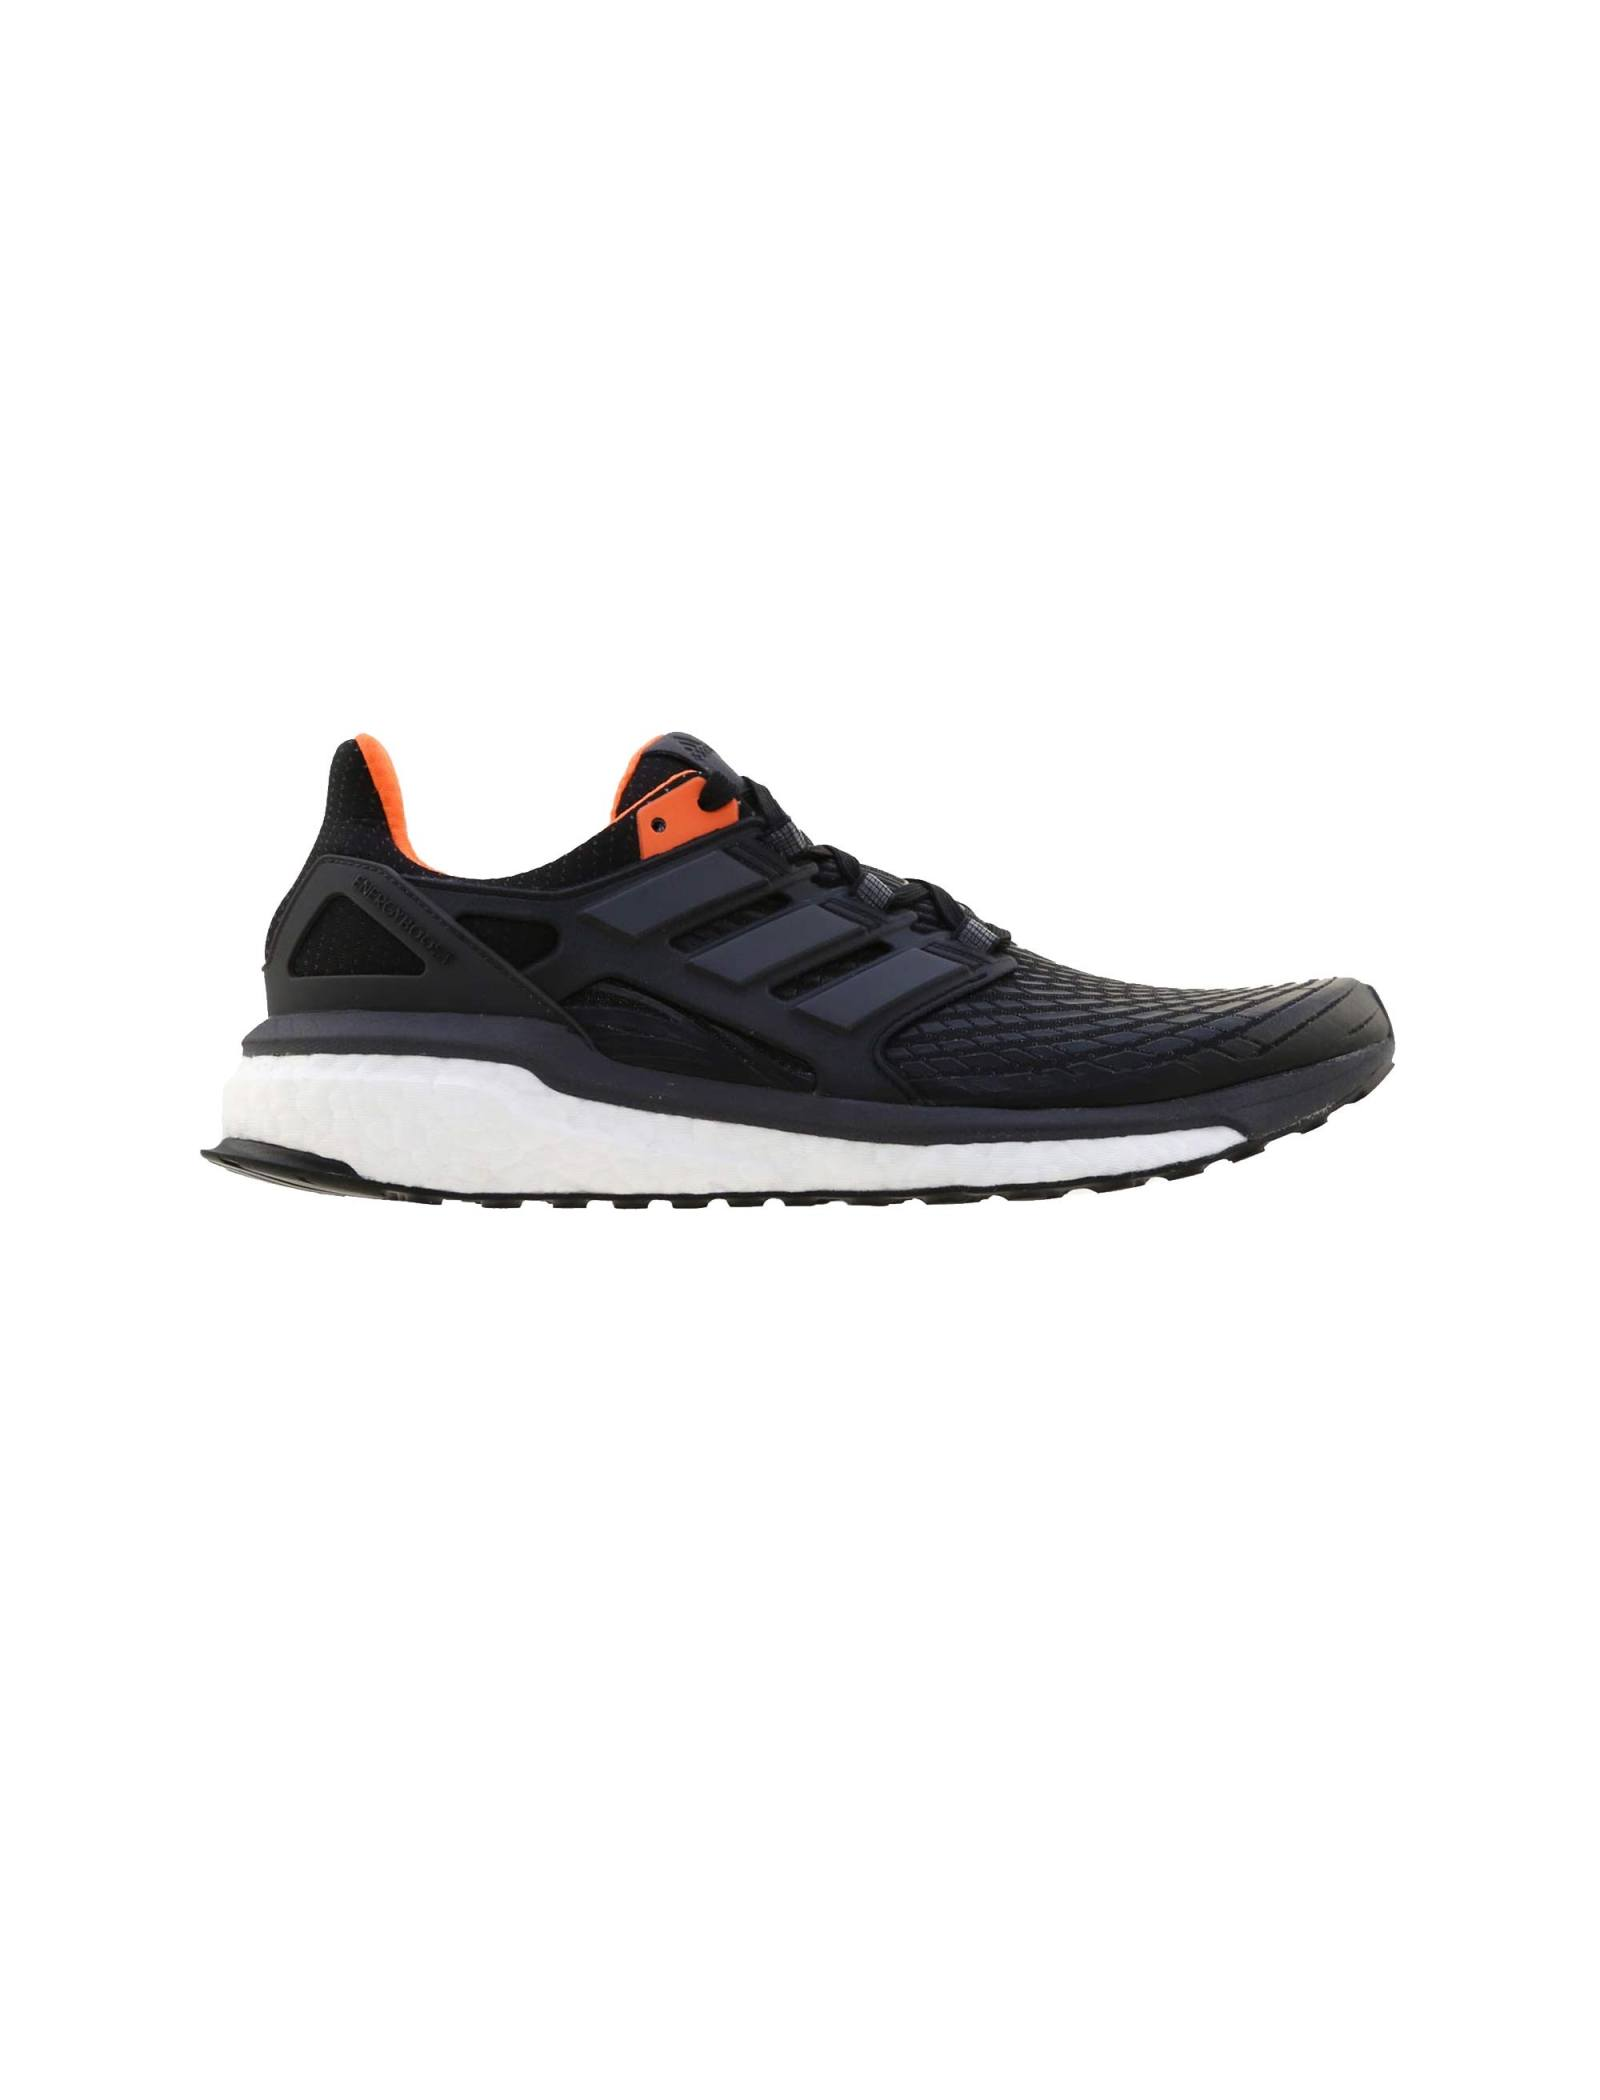 کفش دویدن مردانه آدیداس مدل Energy Boost - مشکي - 1